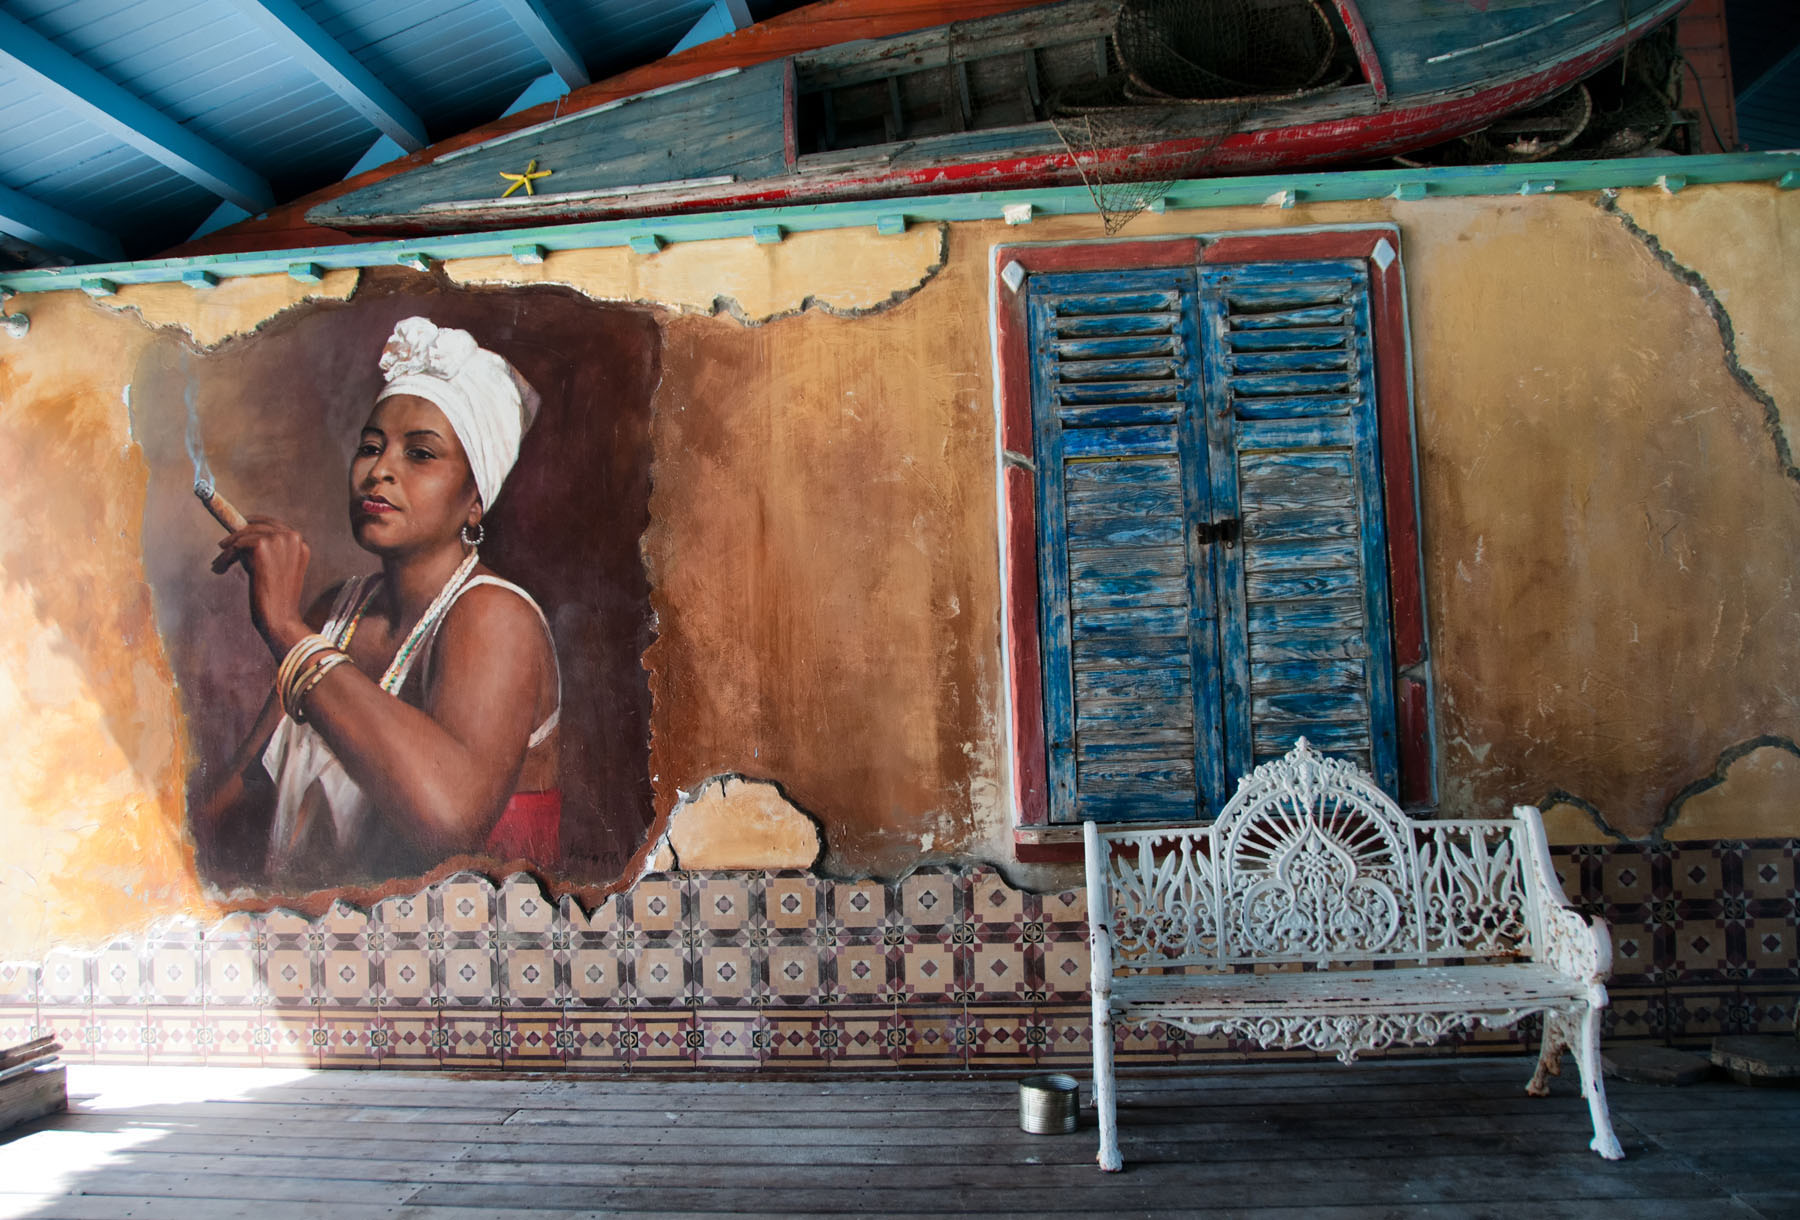 Cuba-Havana_211602022